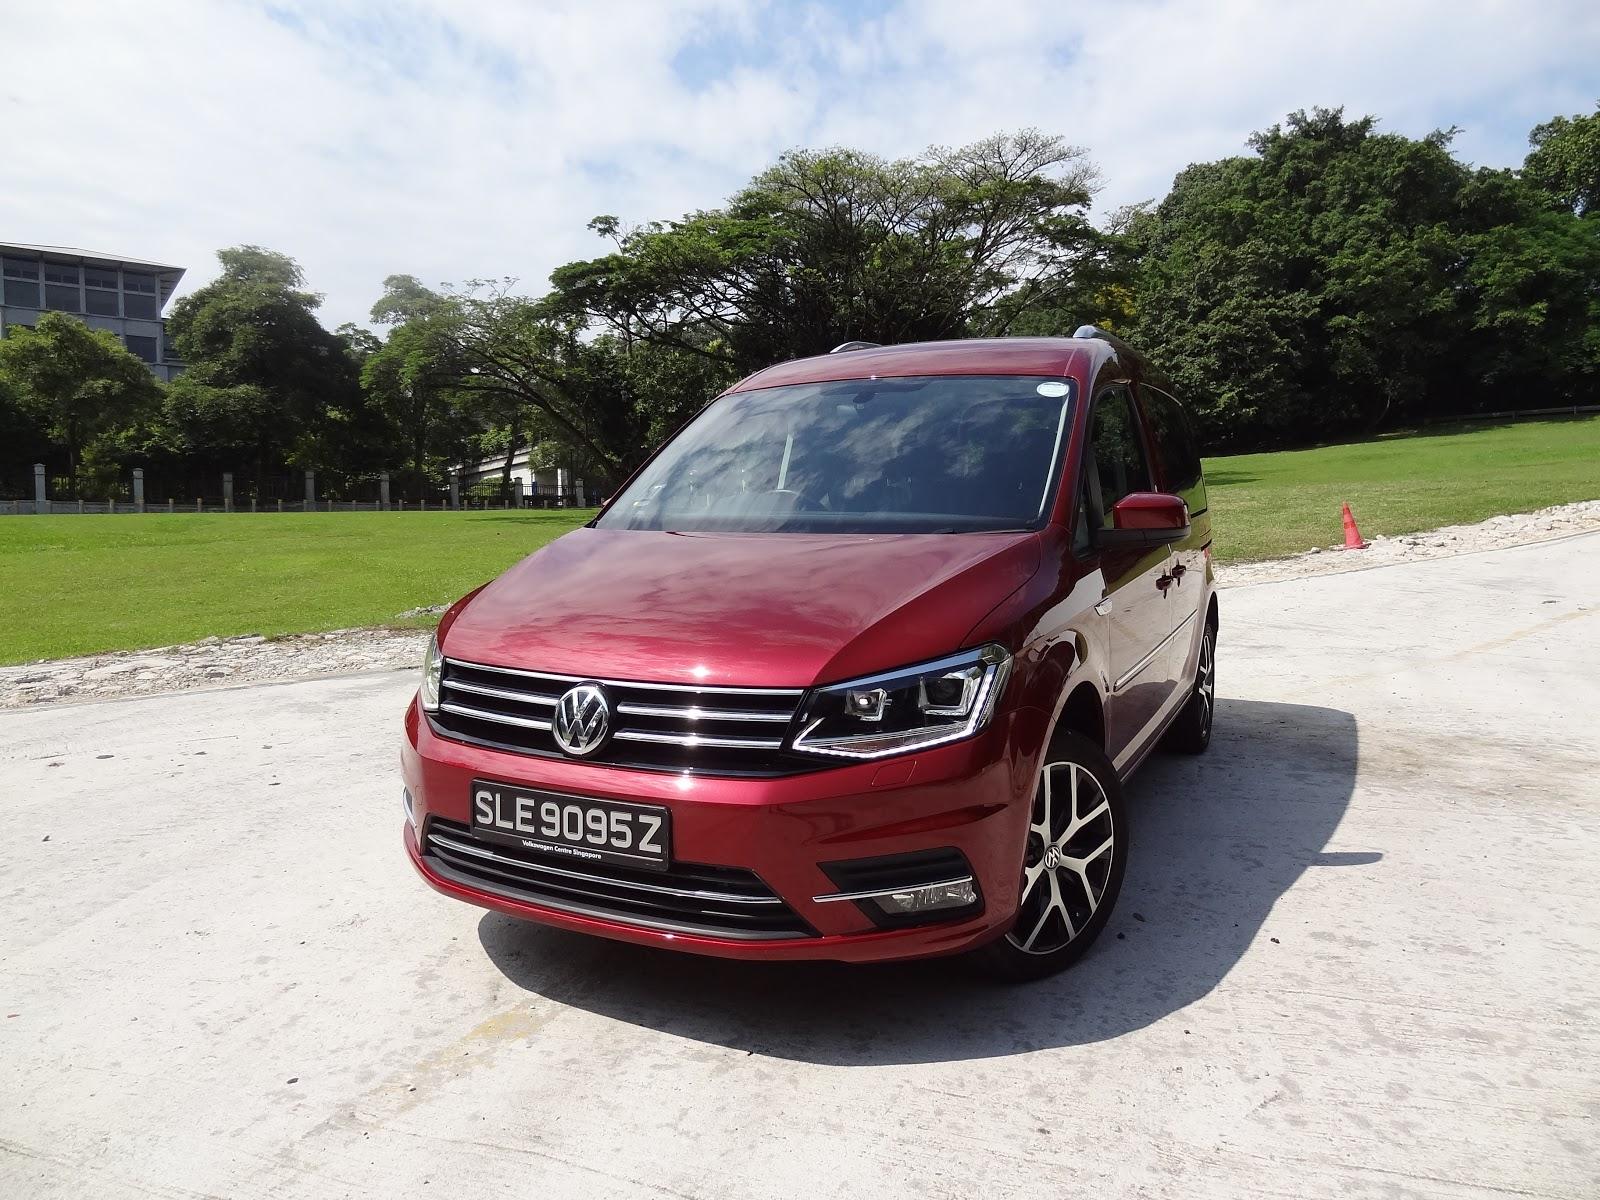 Shaun Owyeong Volkswagen Caddy 1 4 Tsi Car Review